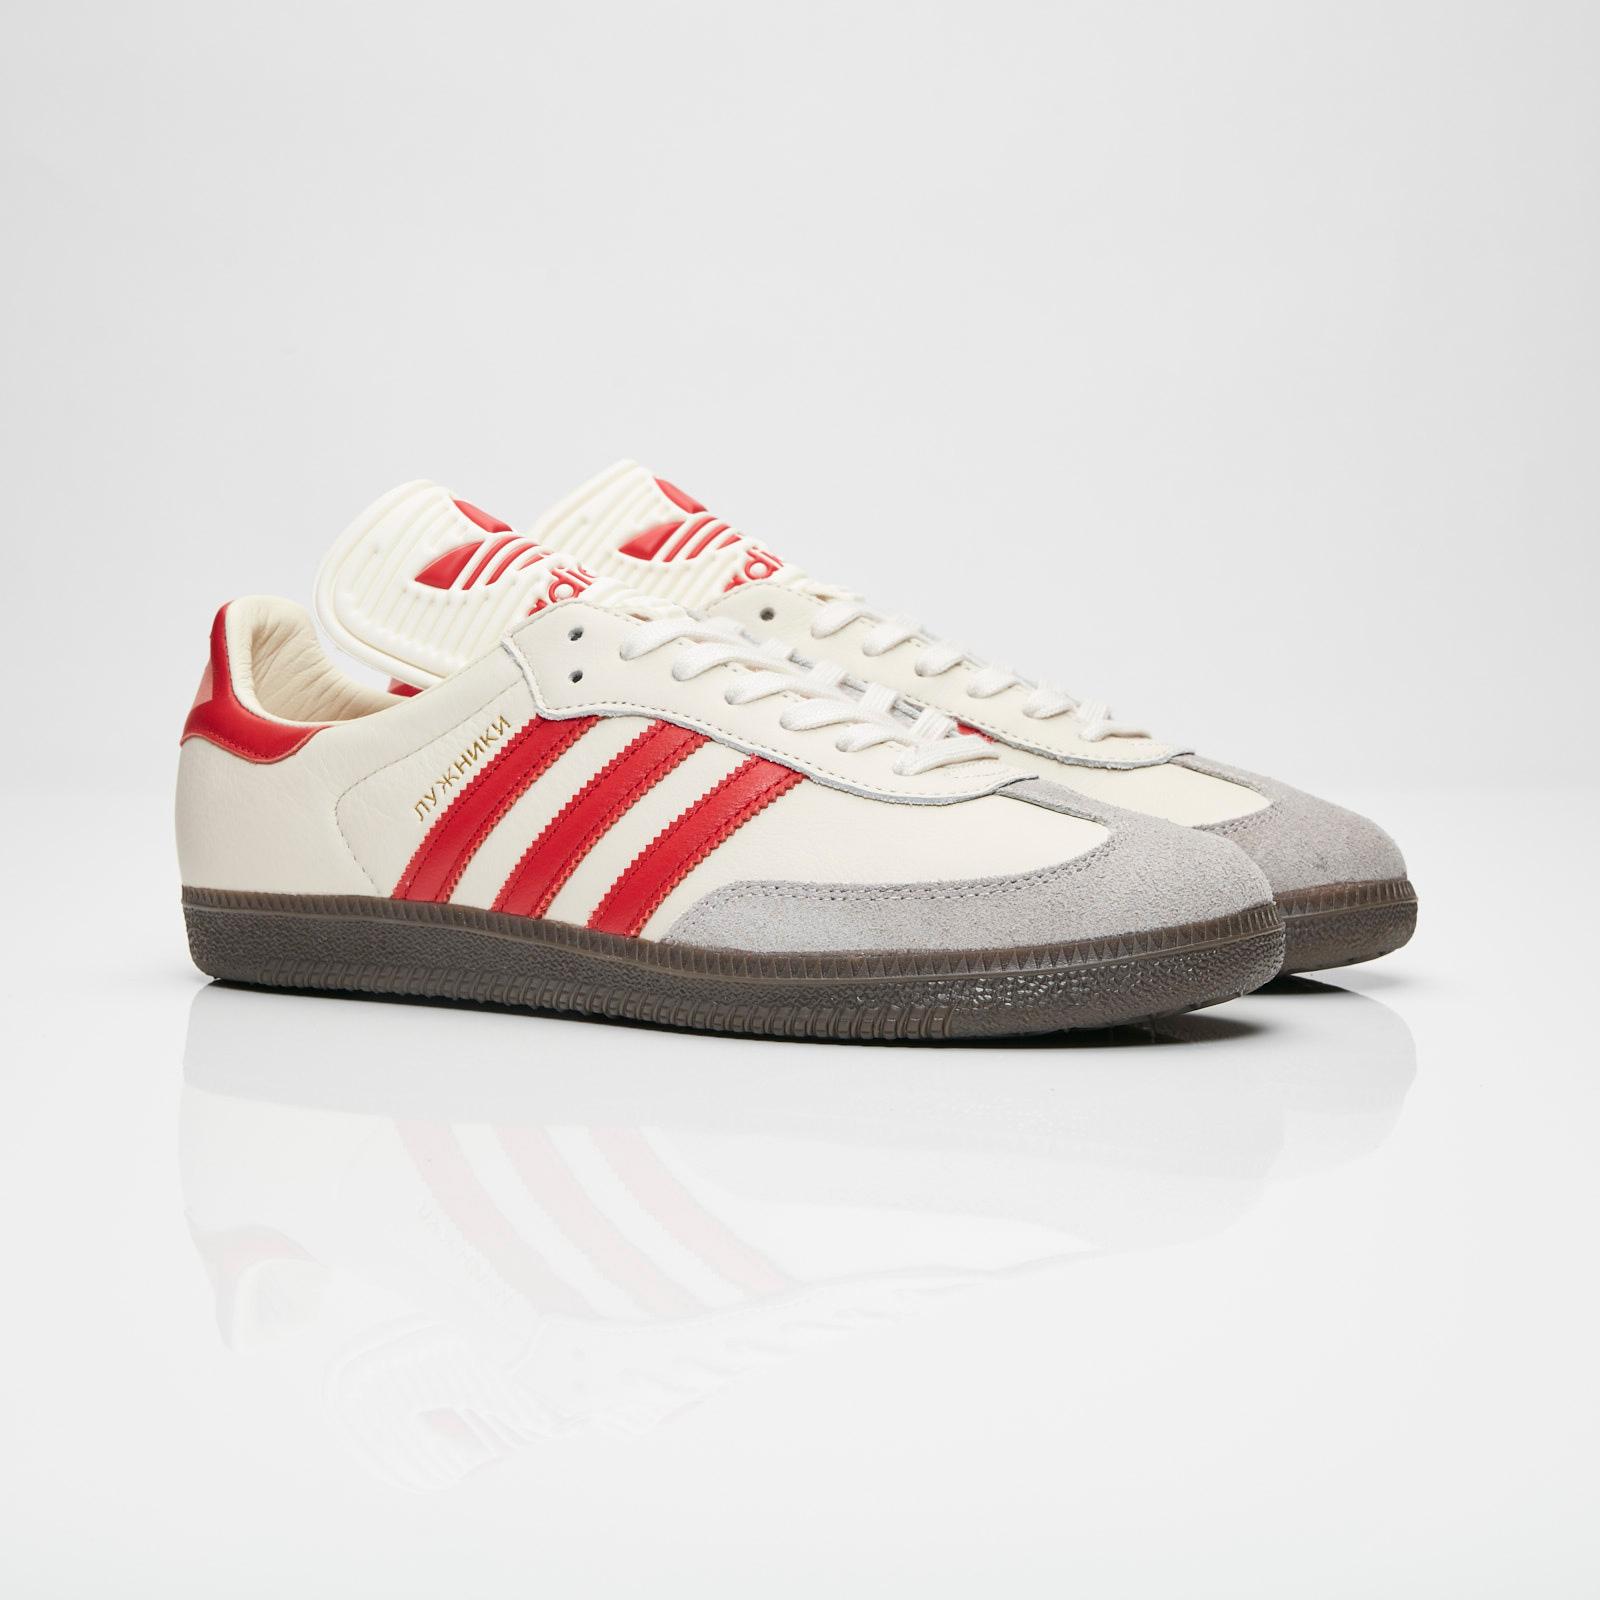 42f2922cb33 adidas Samba Classic OG - Cq2216 - Sneakersnstuff